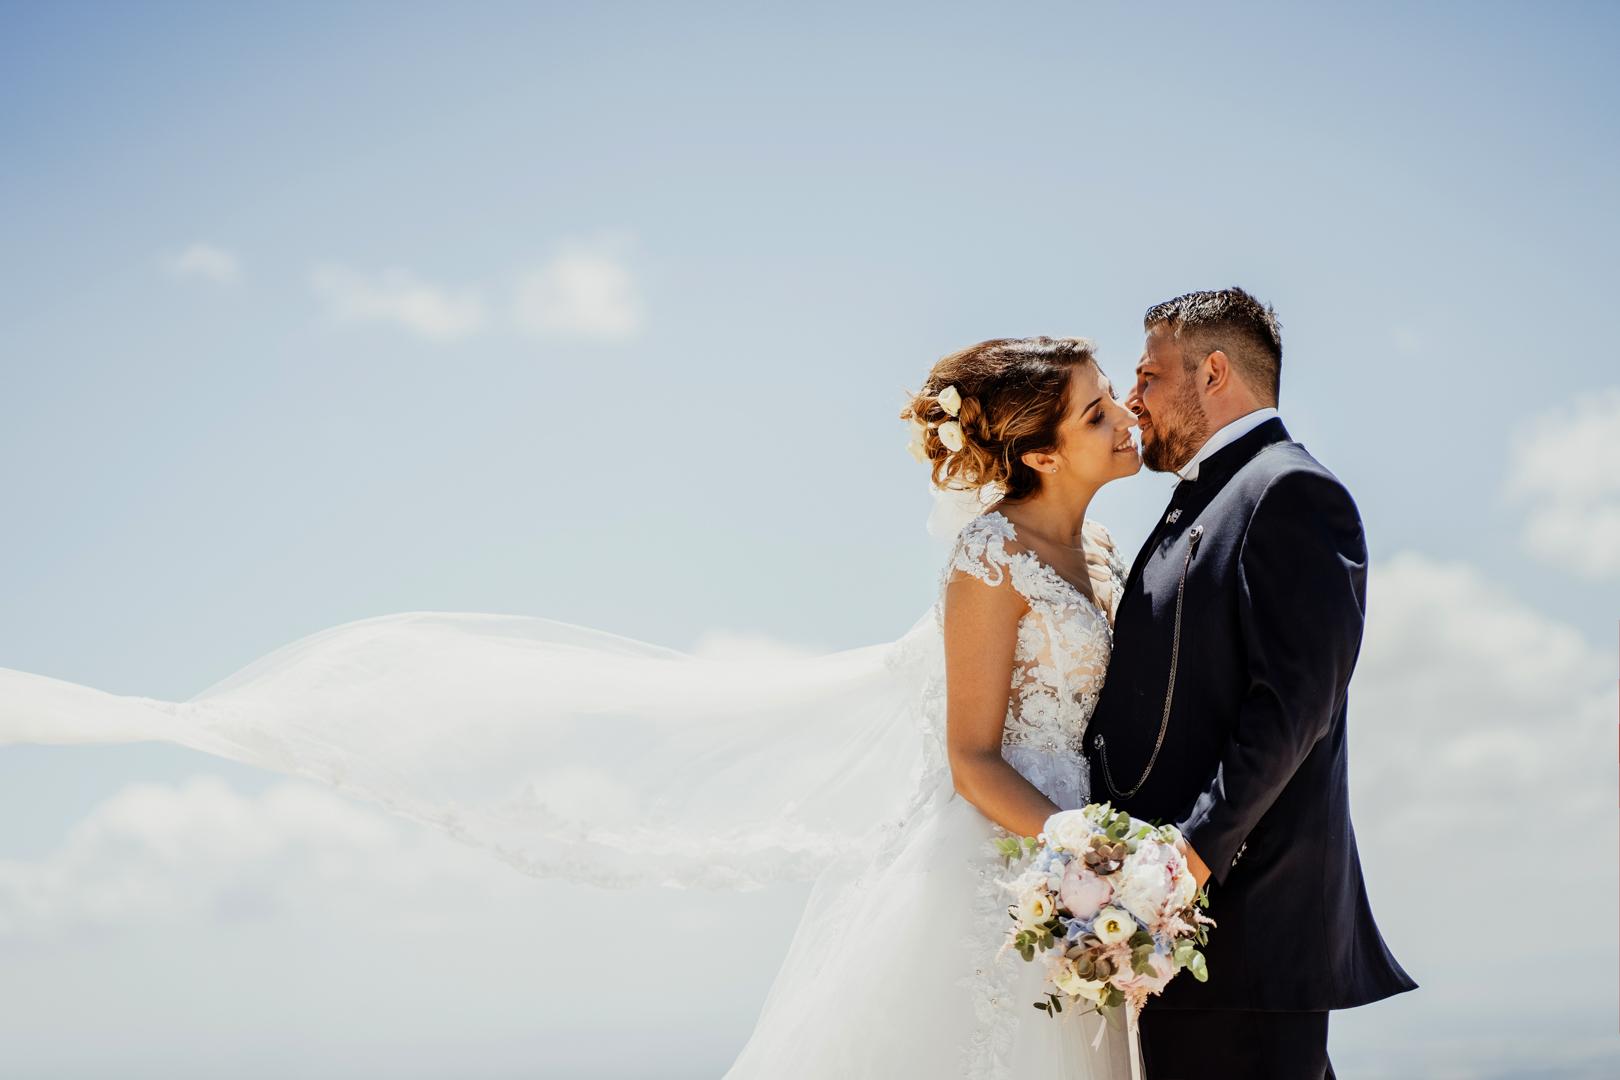 1 gianni-lepore-wedding-rignano-